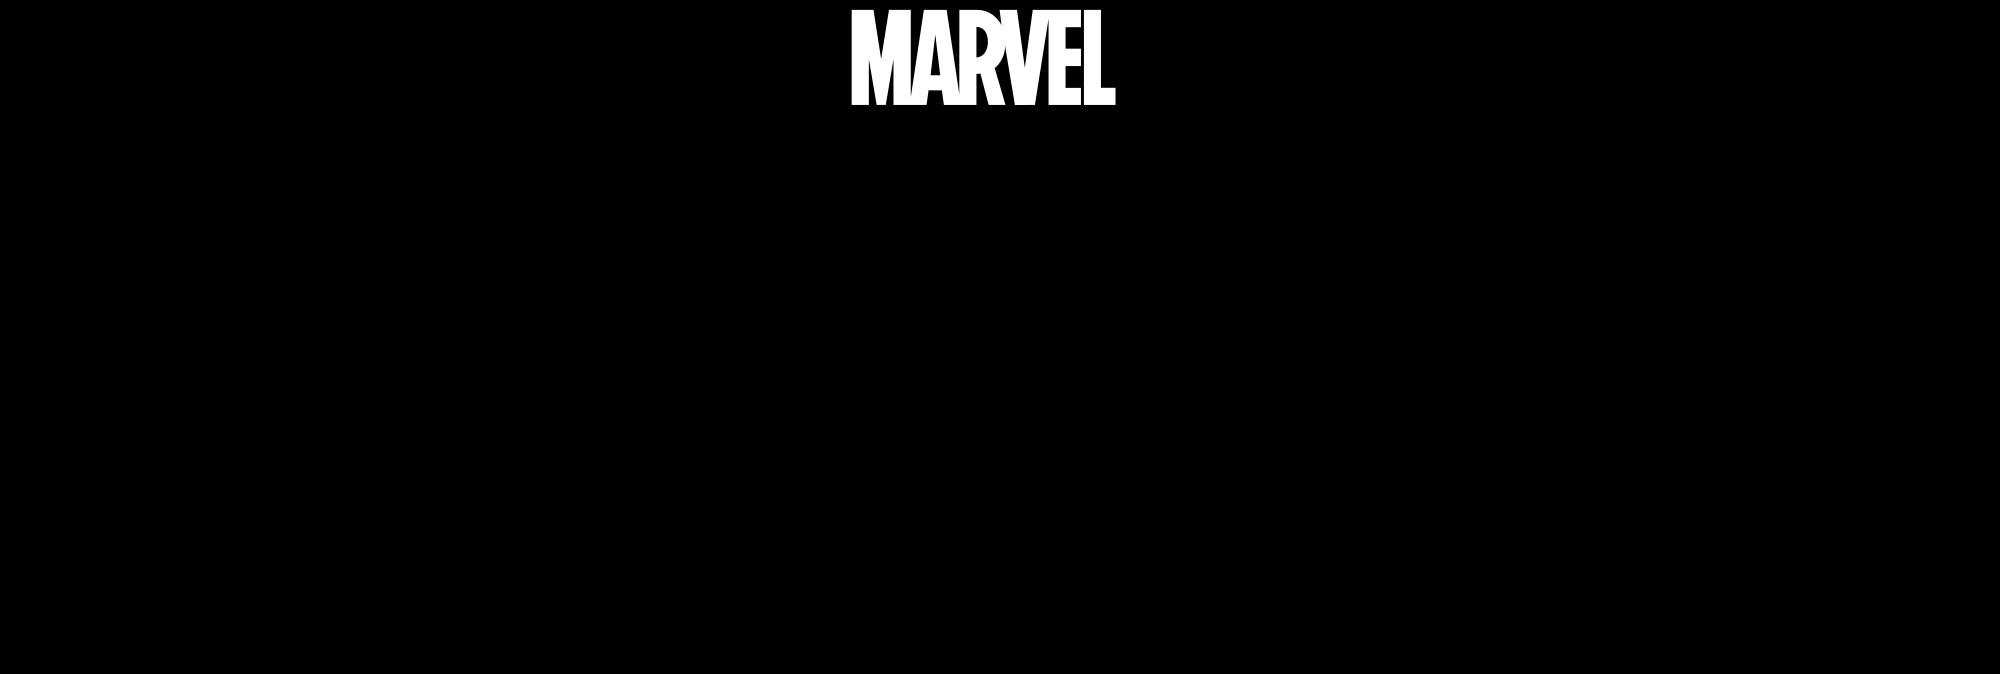 2000x674 Fileguardians Of The Galaxy Logo Black.svg